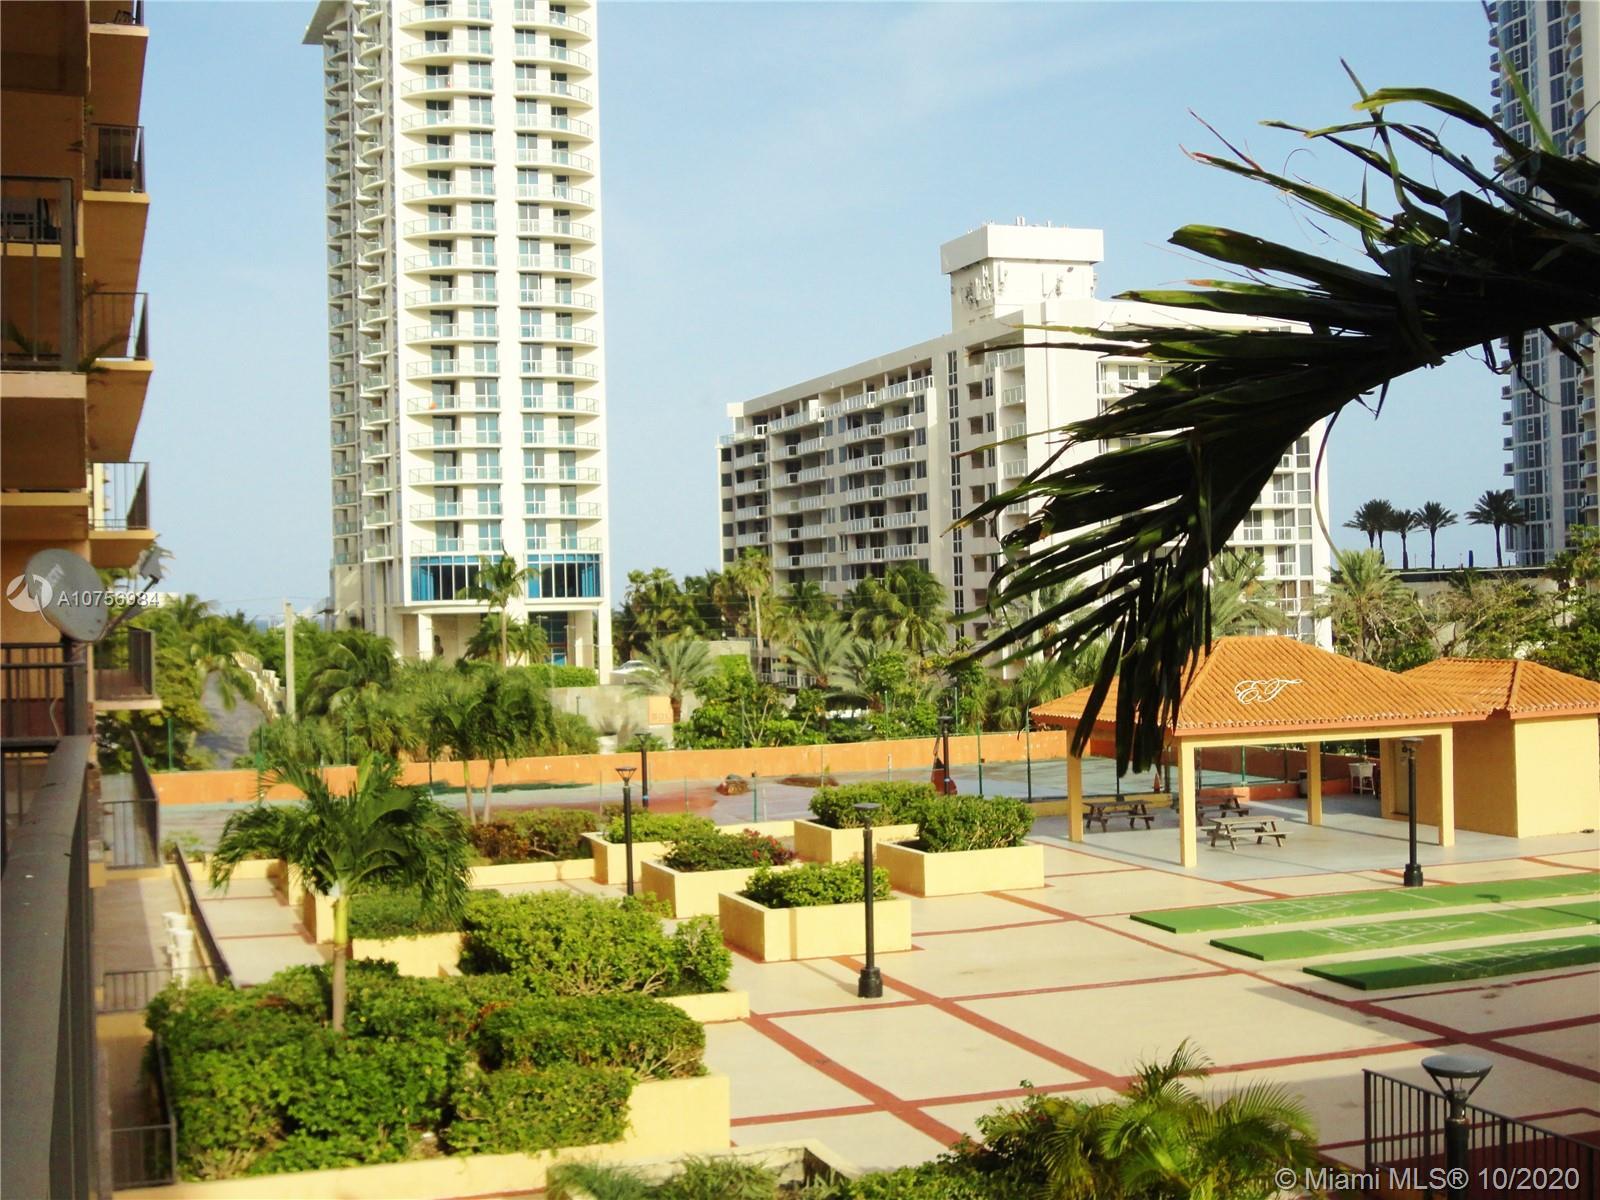 Winston Tower 600 #504 - 210 174 ST. #504, Sunny Isles Beach, FL 33160